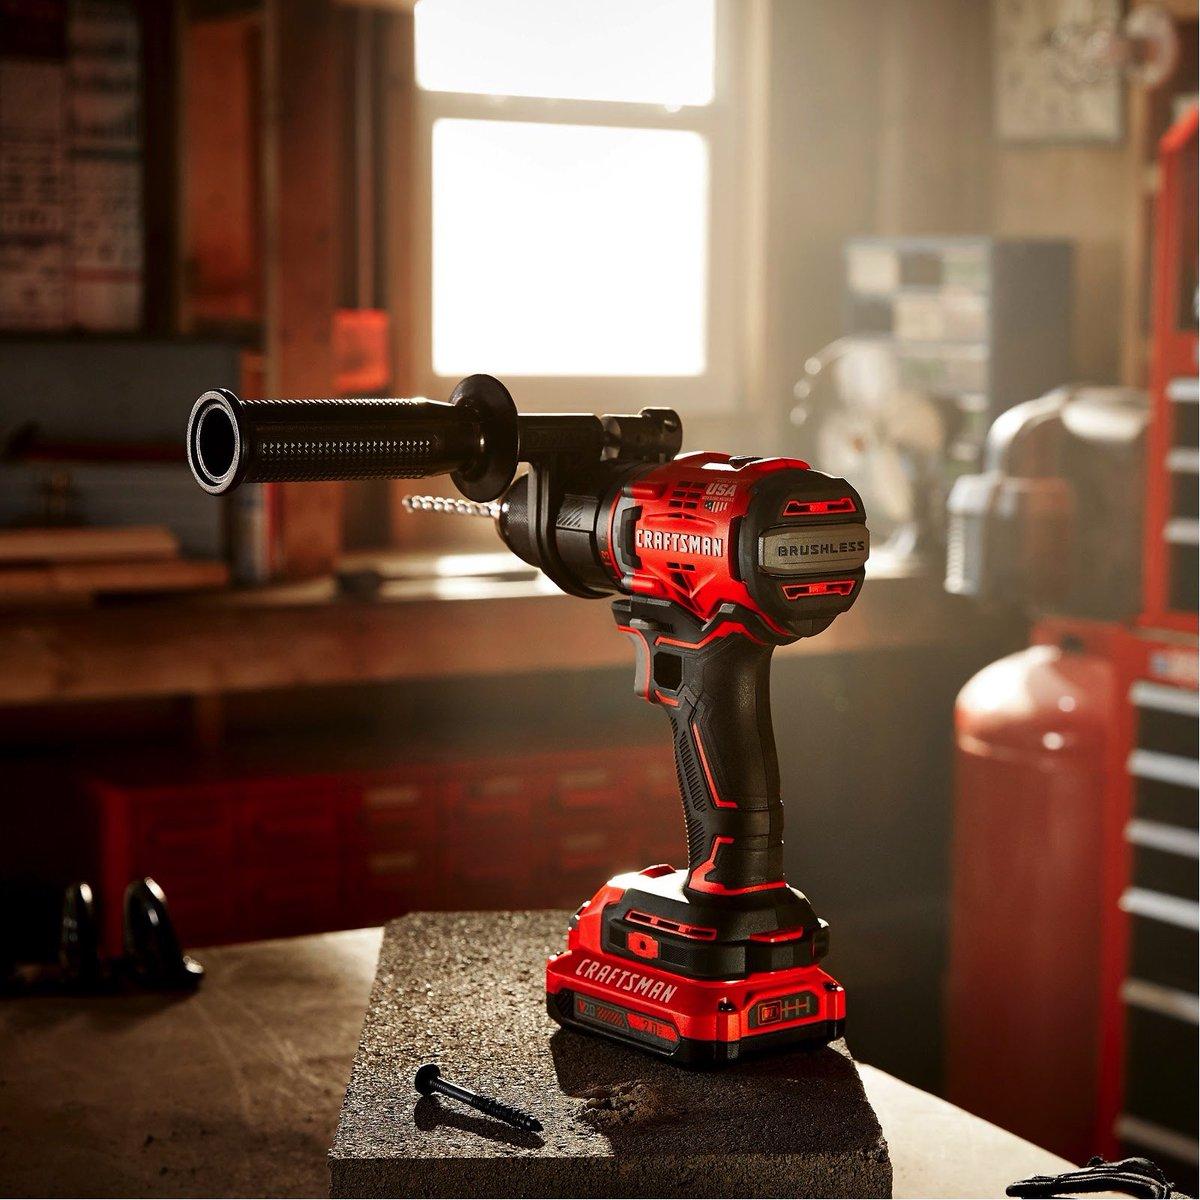 Craftsman Power Tools Lowes